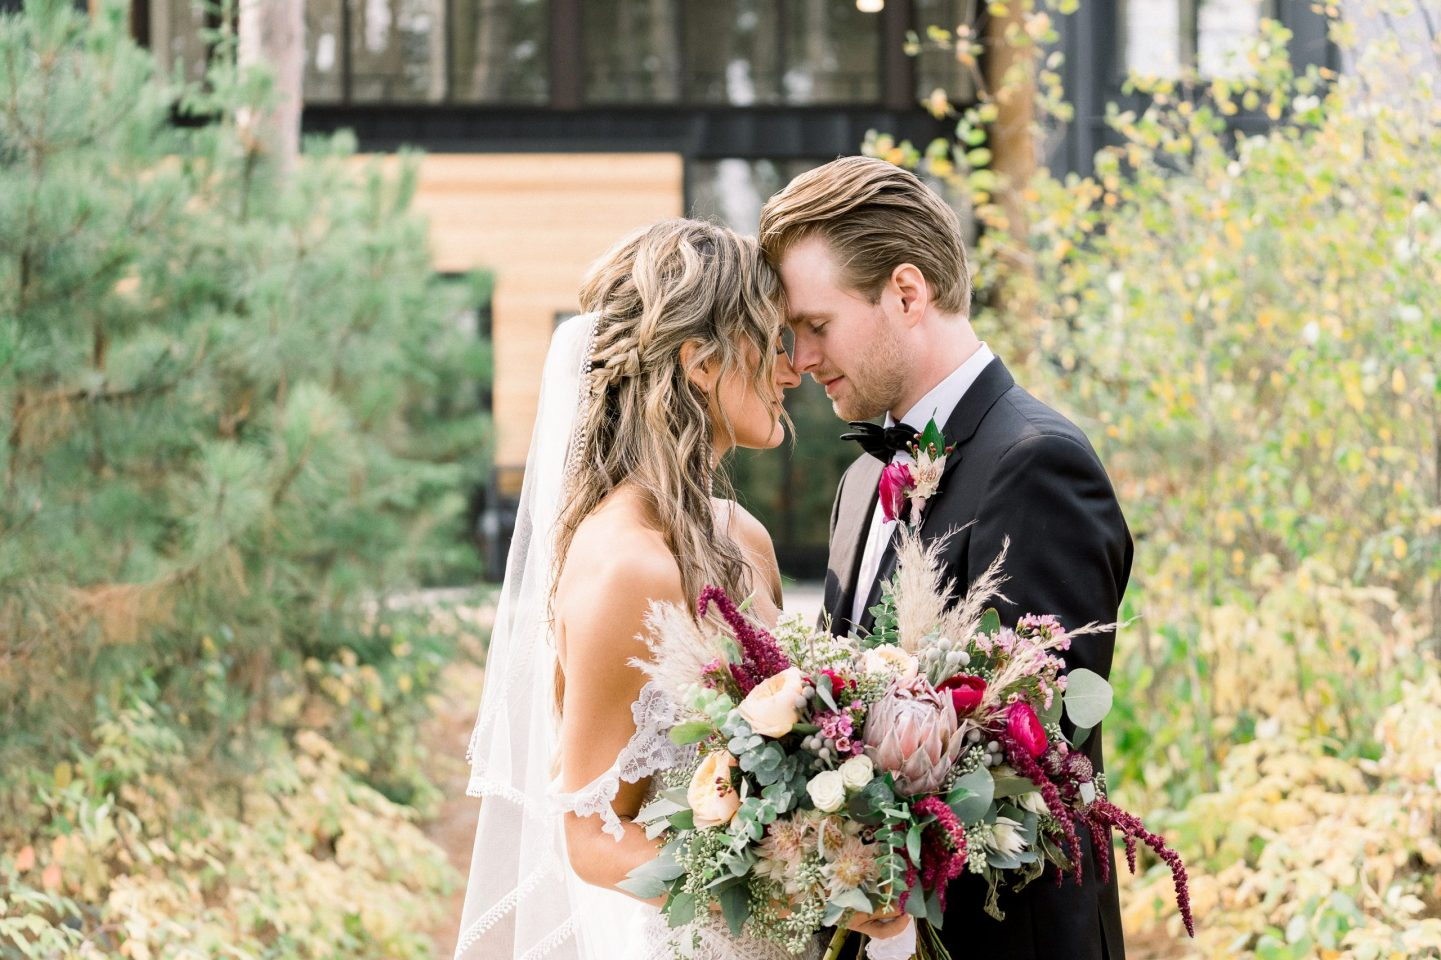 Kailey Billy Fine Art Wedding Photography Pinewood Event Center Cambridge MN 2020 130